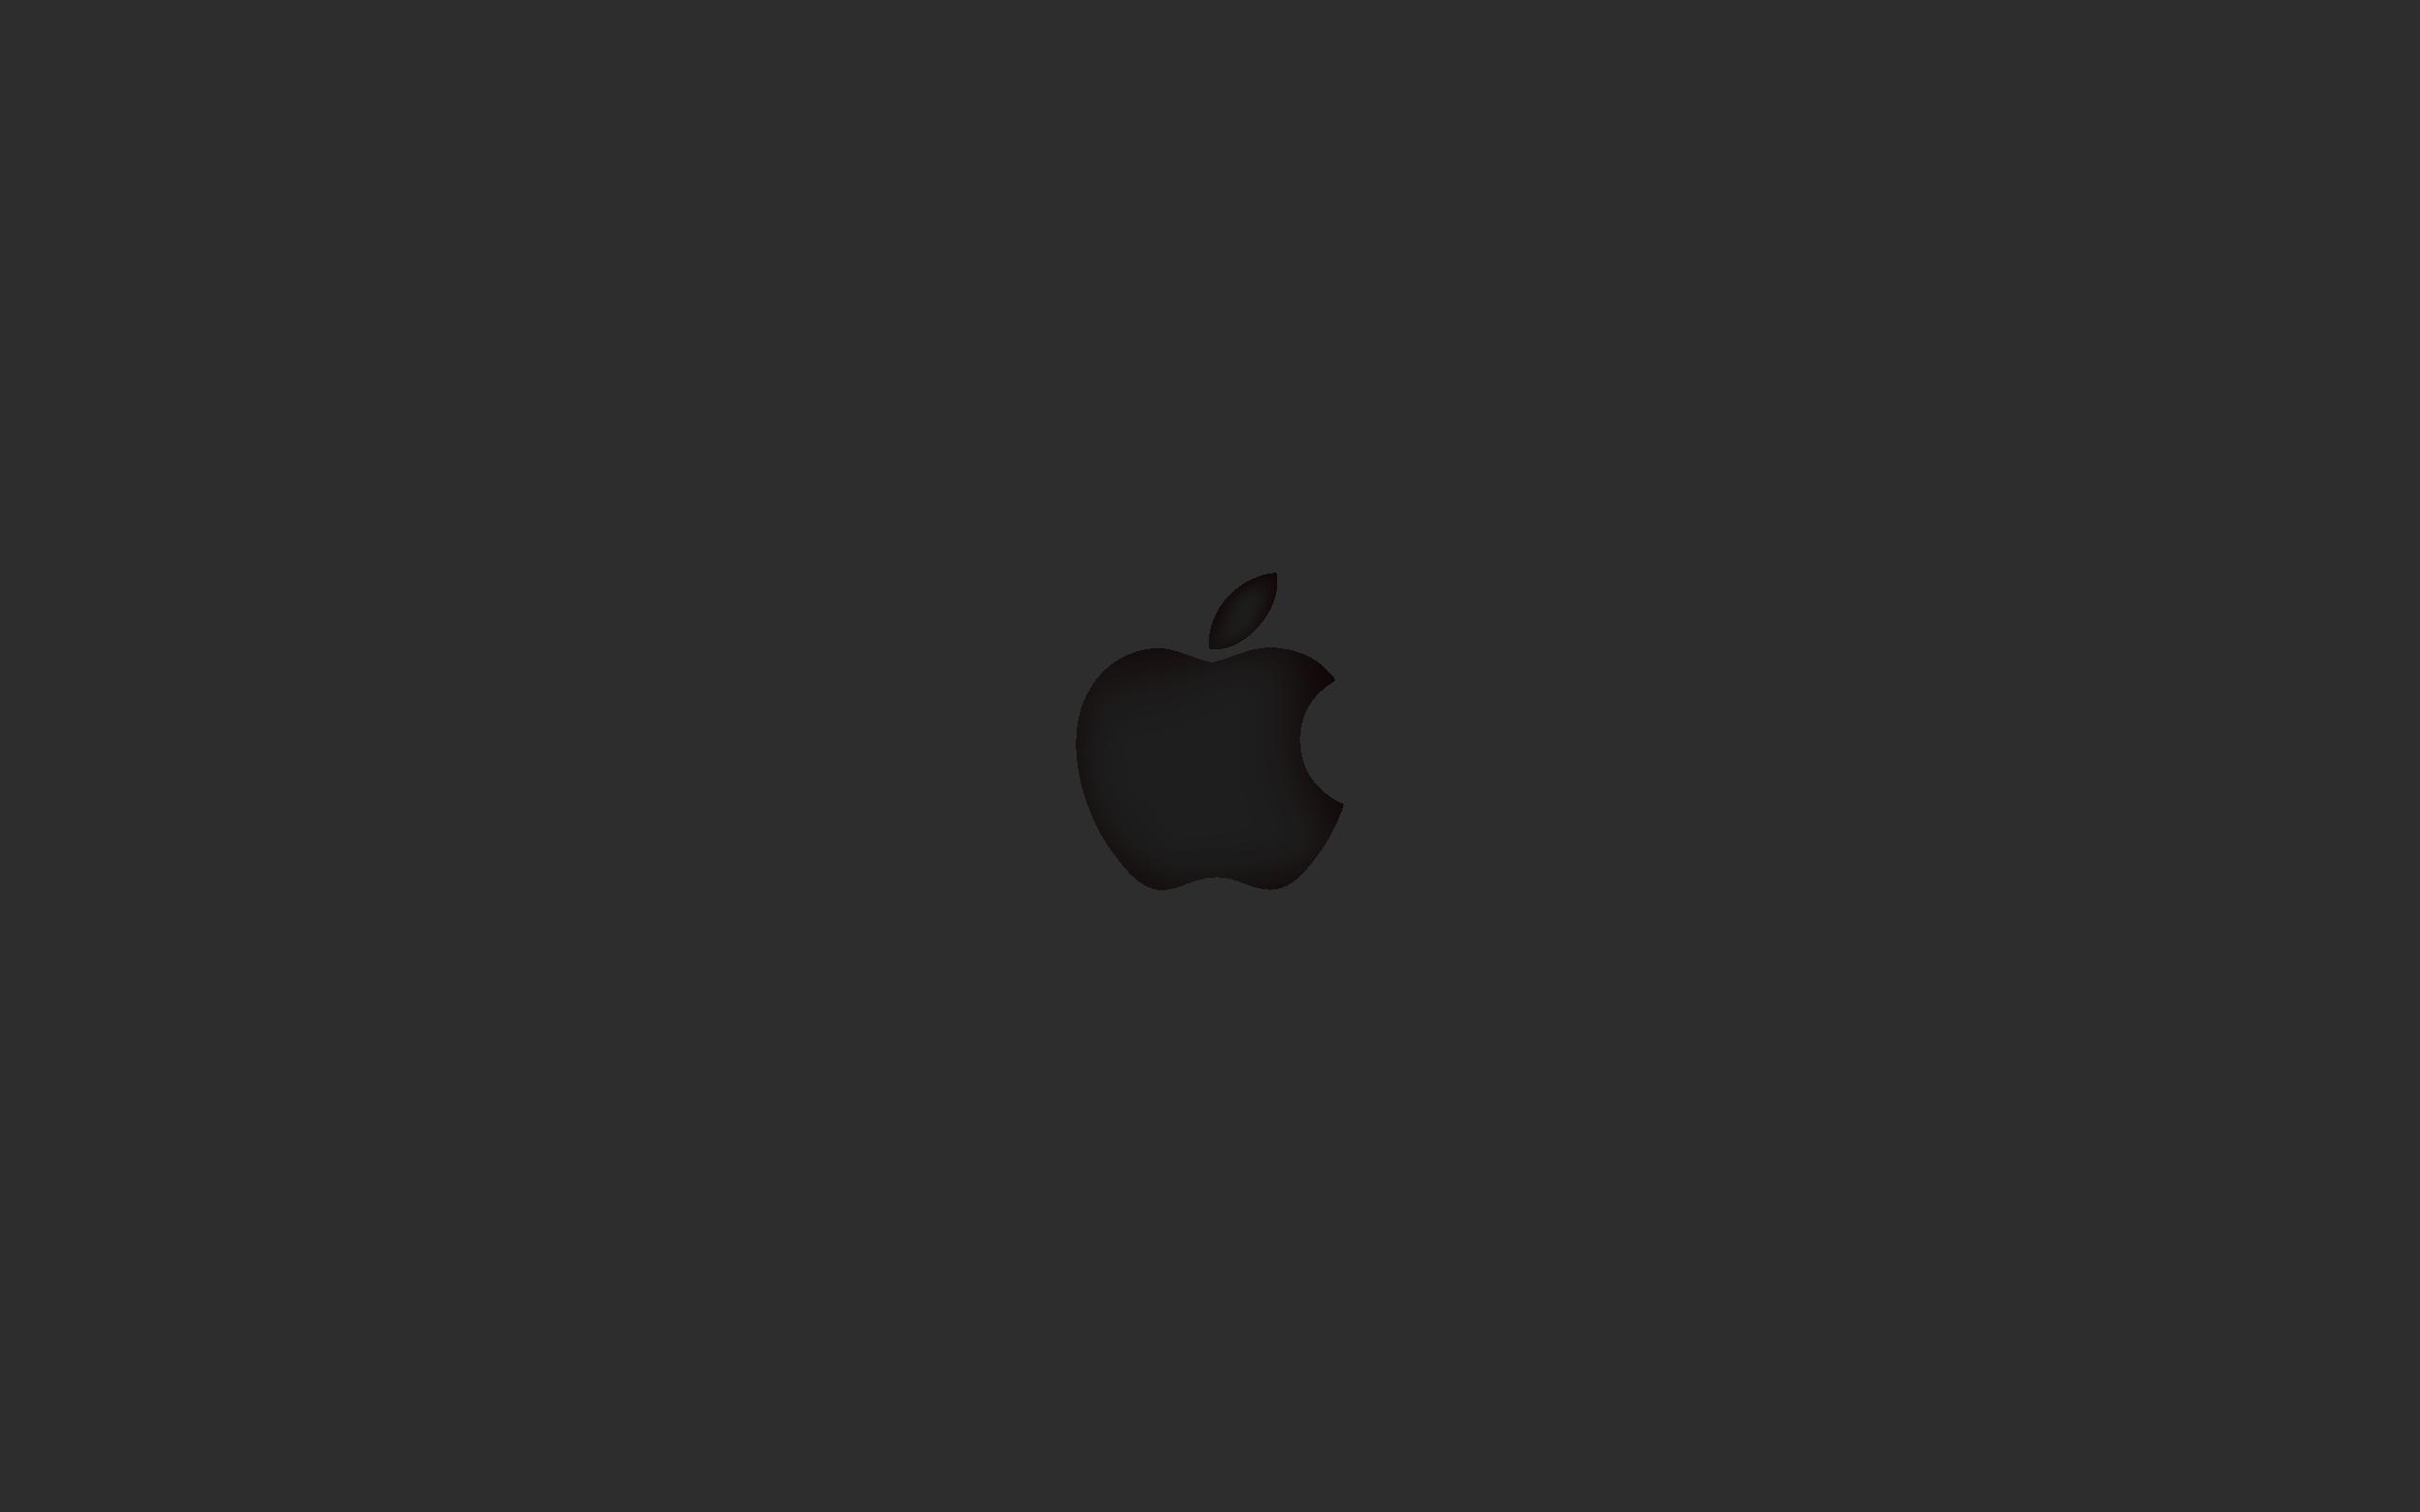 Apple Imprint Dark Wallpaper (2560 x 1600)